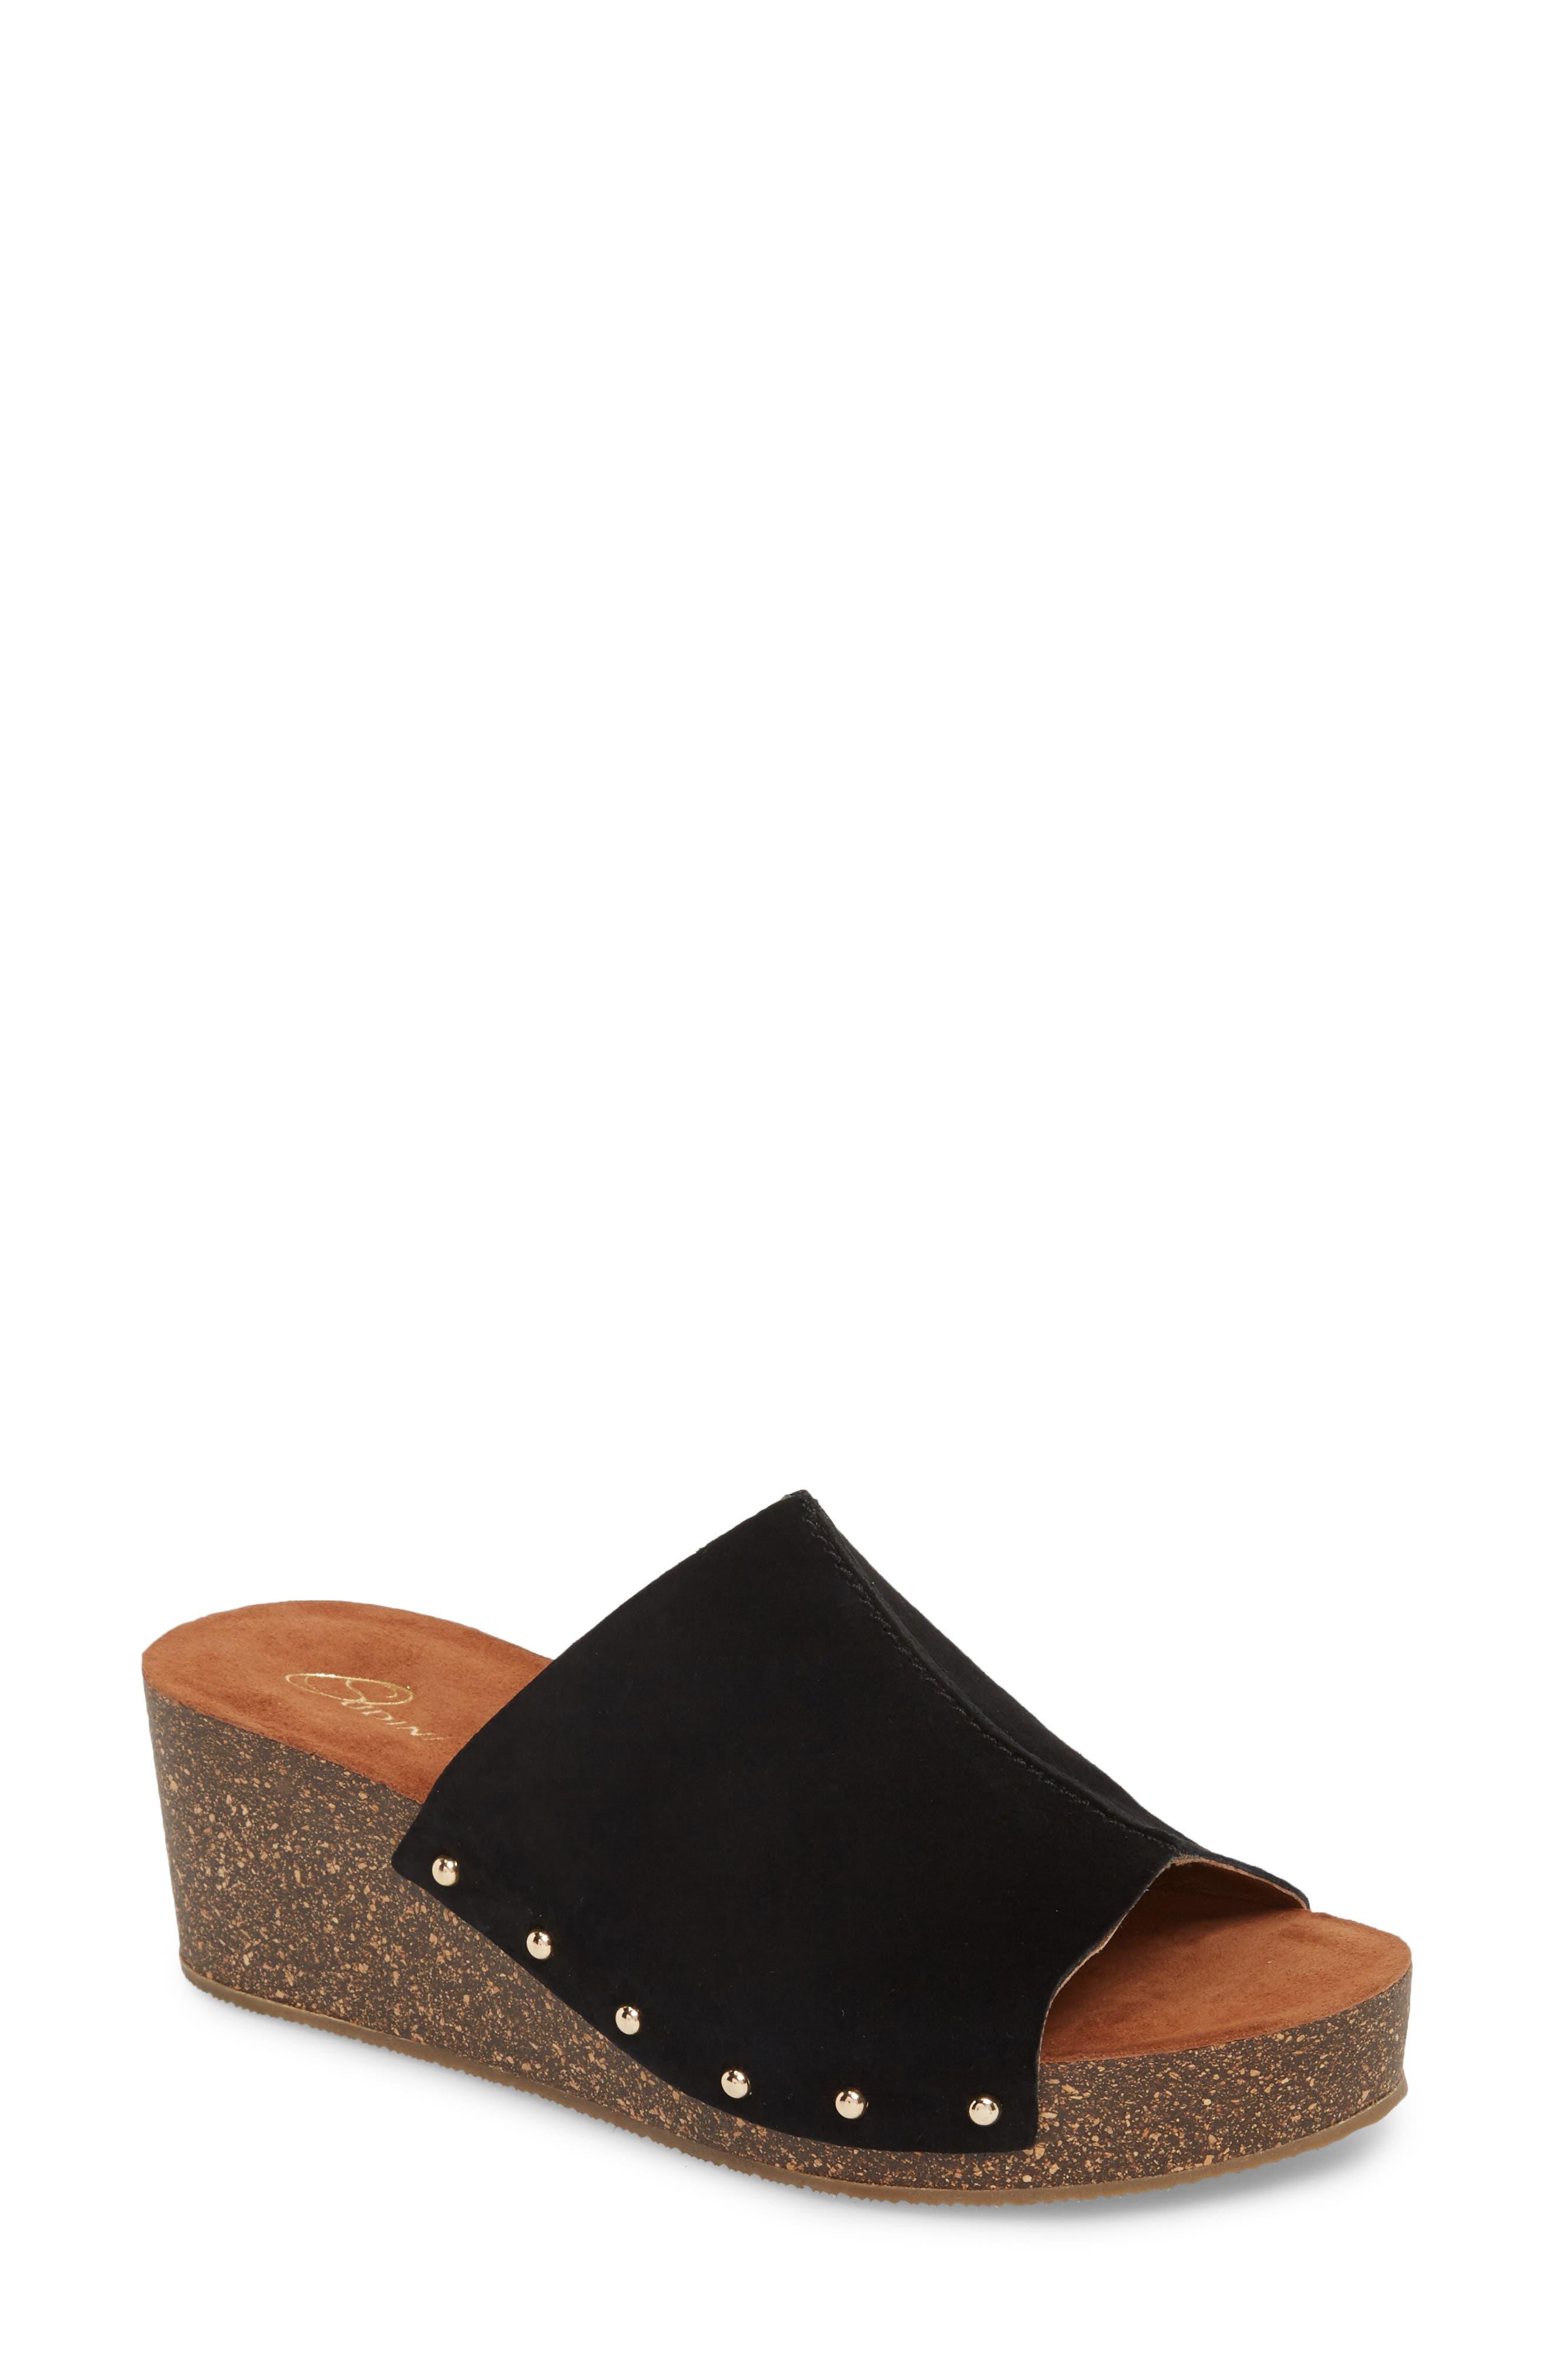 Pavia Wedge Mule,                             Main thumbnail 1, color,                             Black Leather